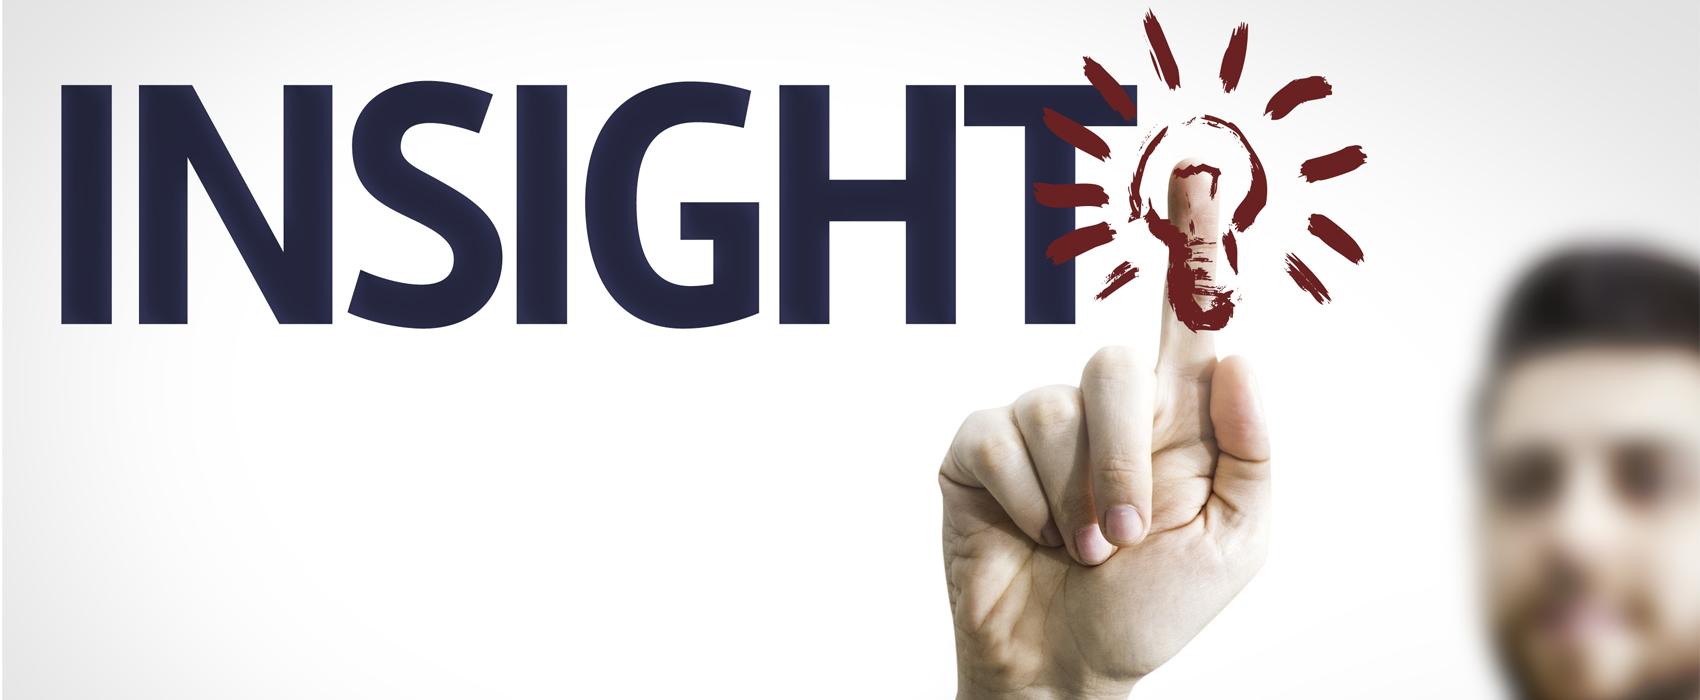 Insight-1